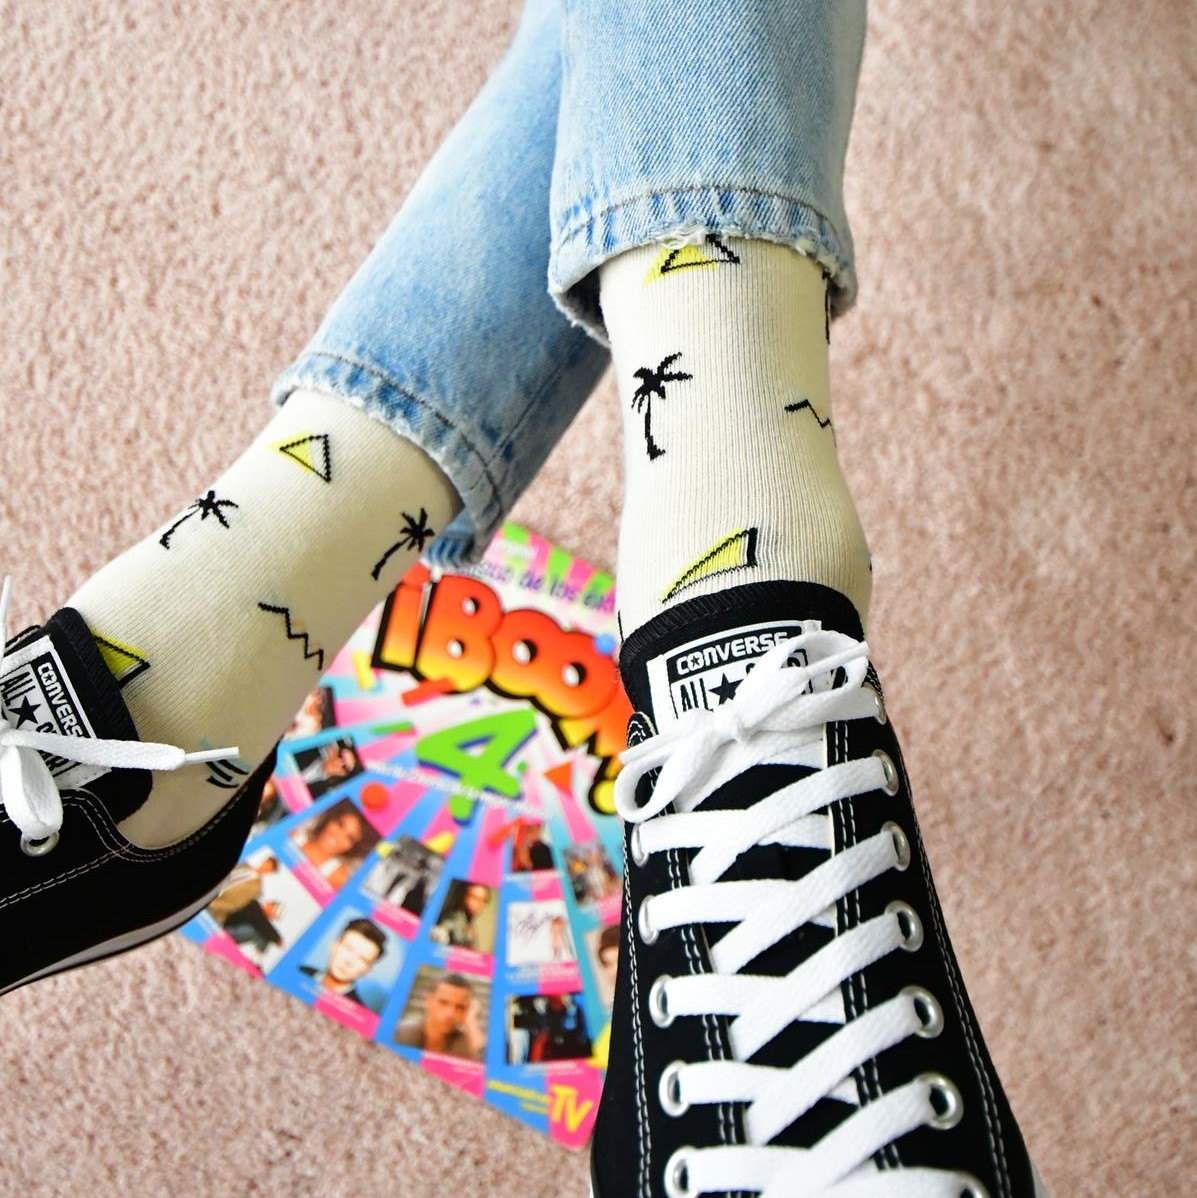 amorsocks-calcetines-socks-miami-palm-palmbeach-beige-palmeras-90s-coleccion